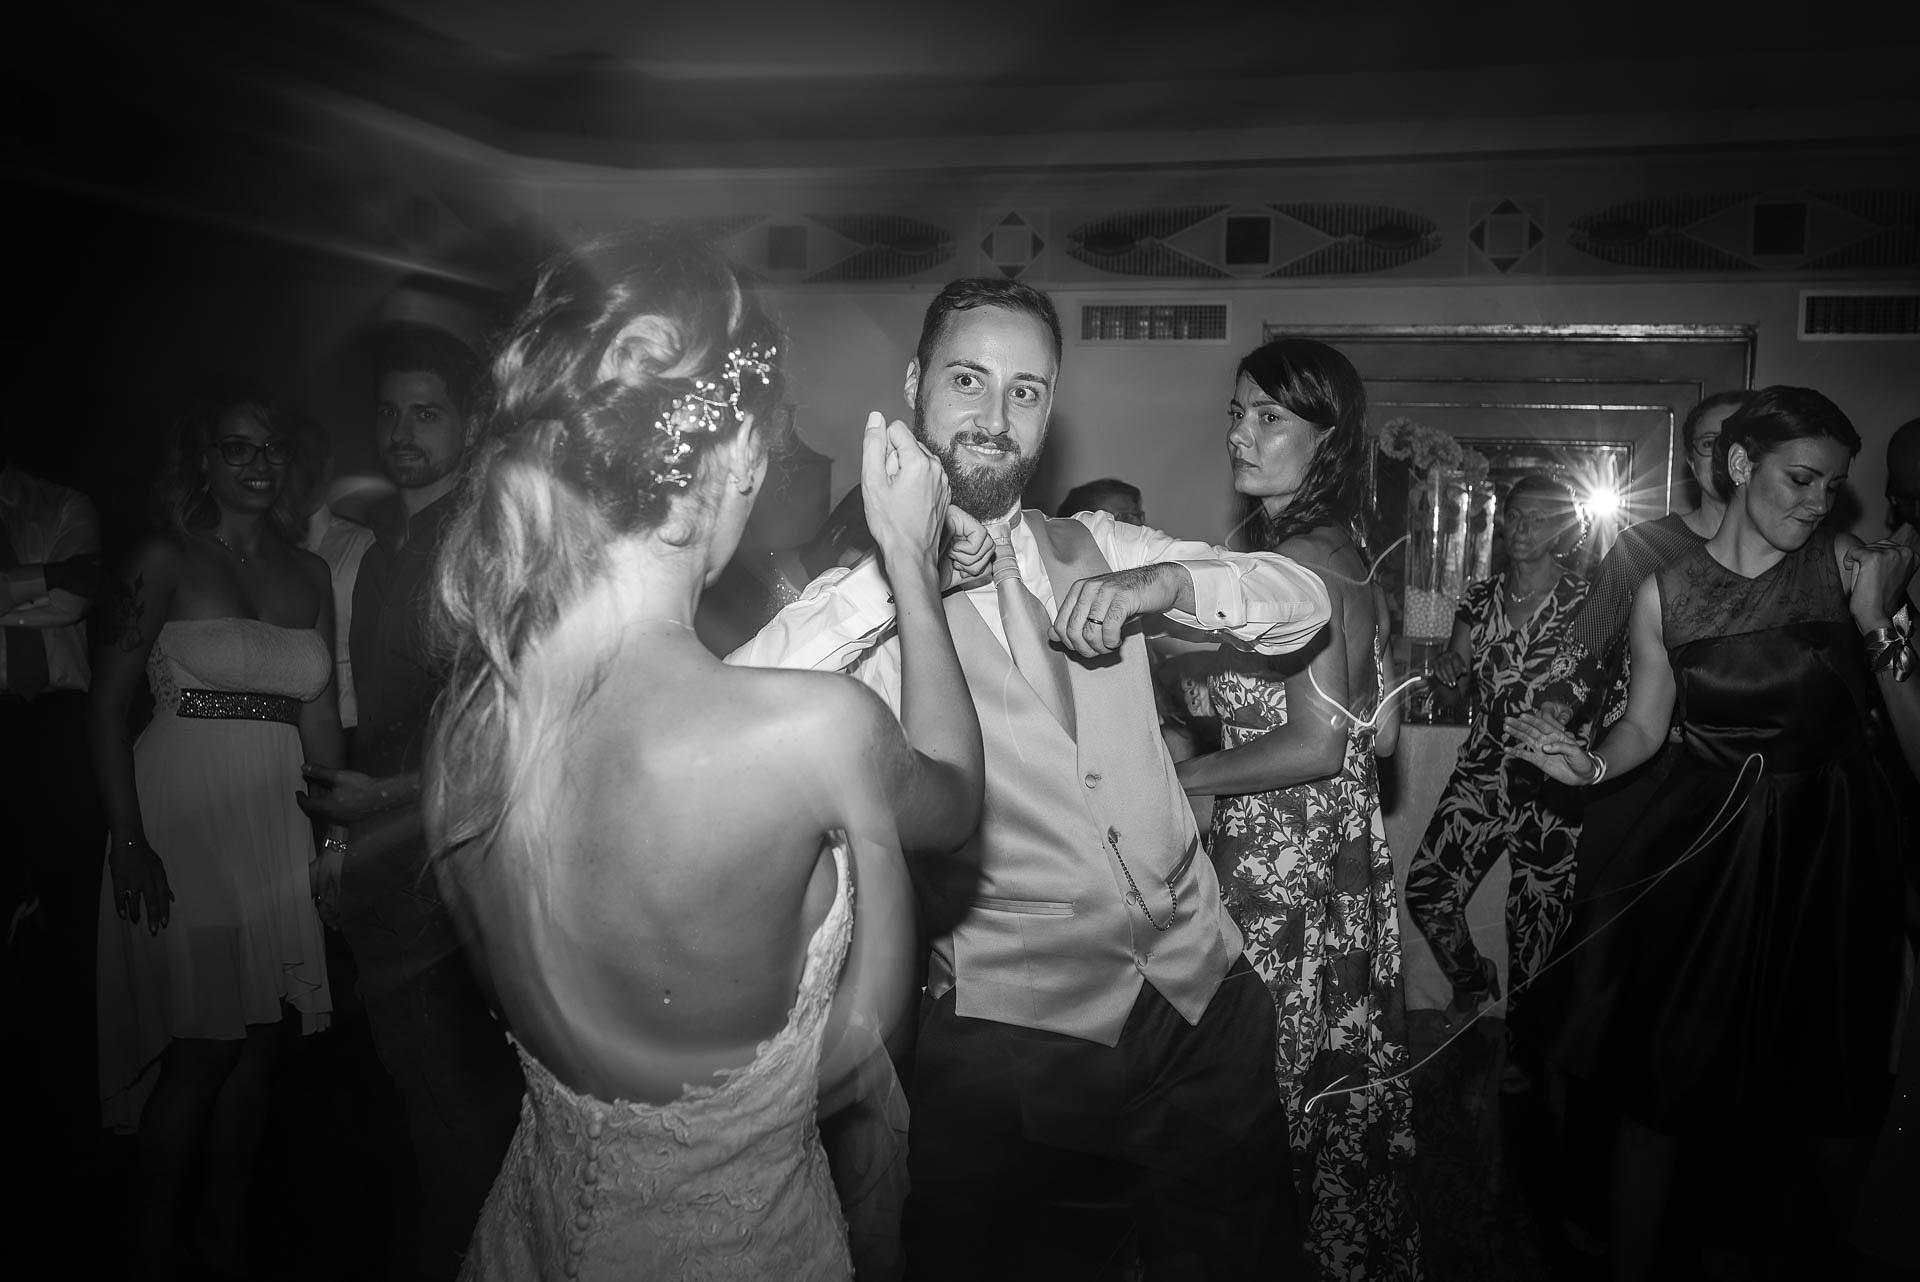 foto-festa-matrimonio-roma-17